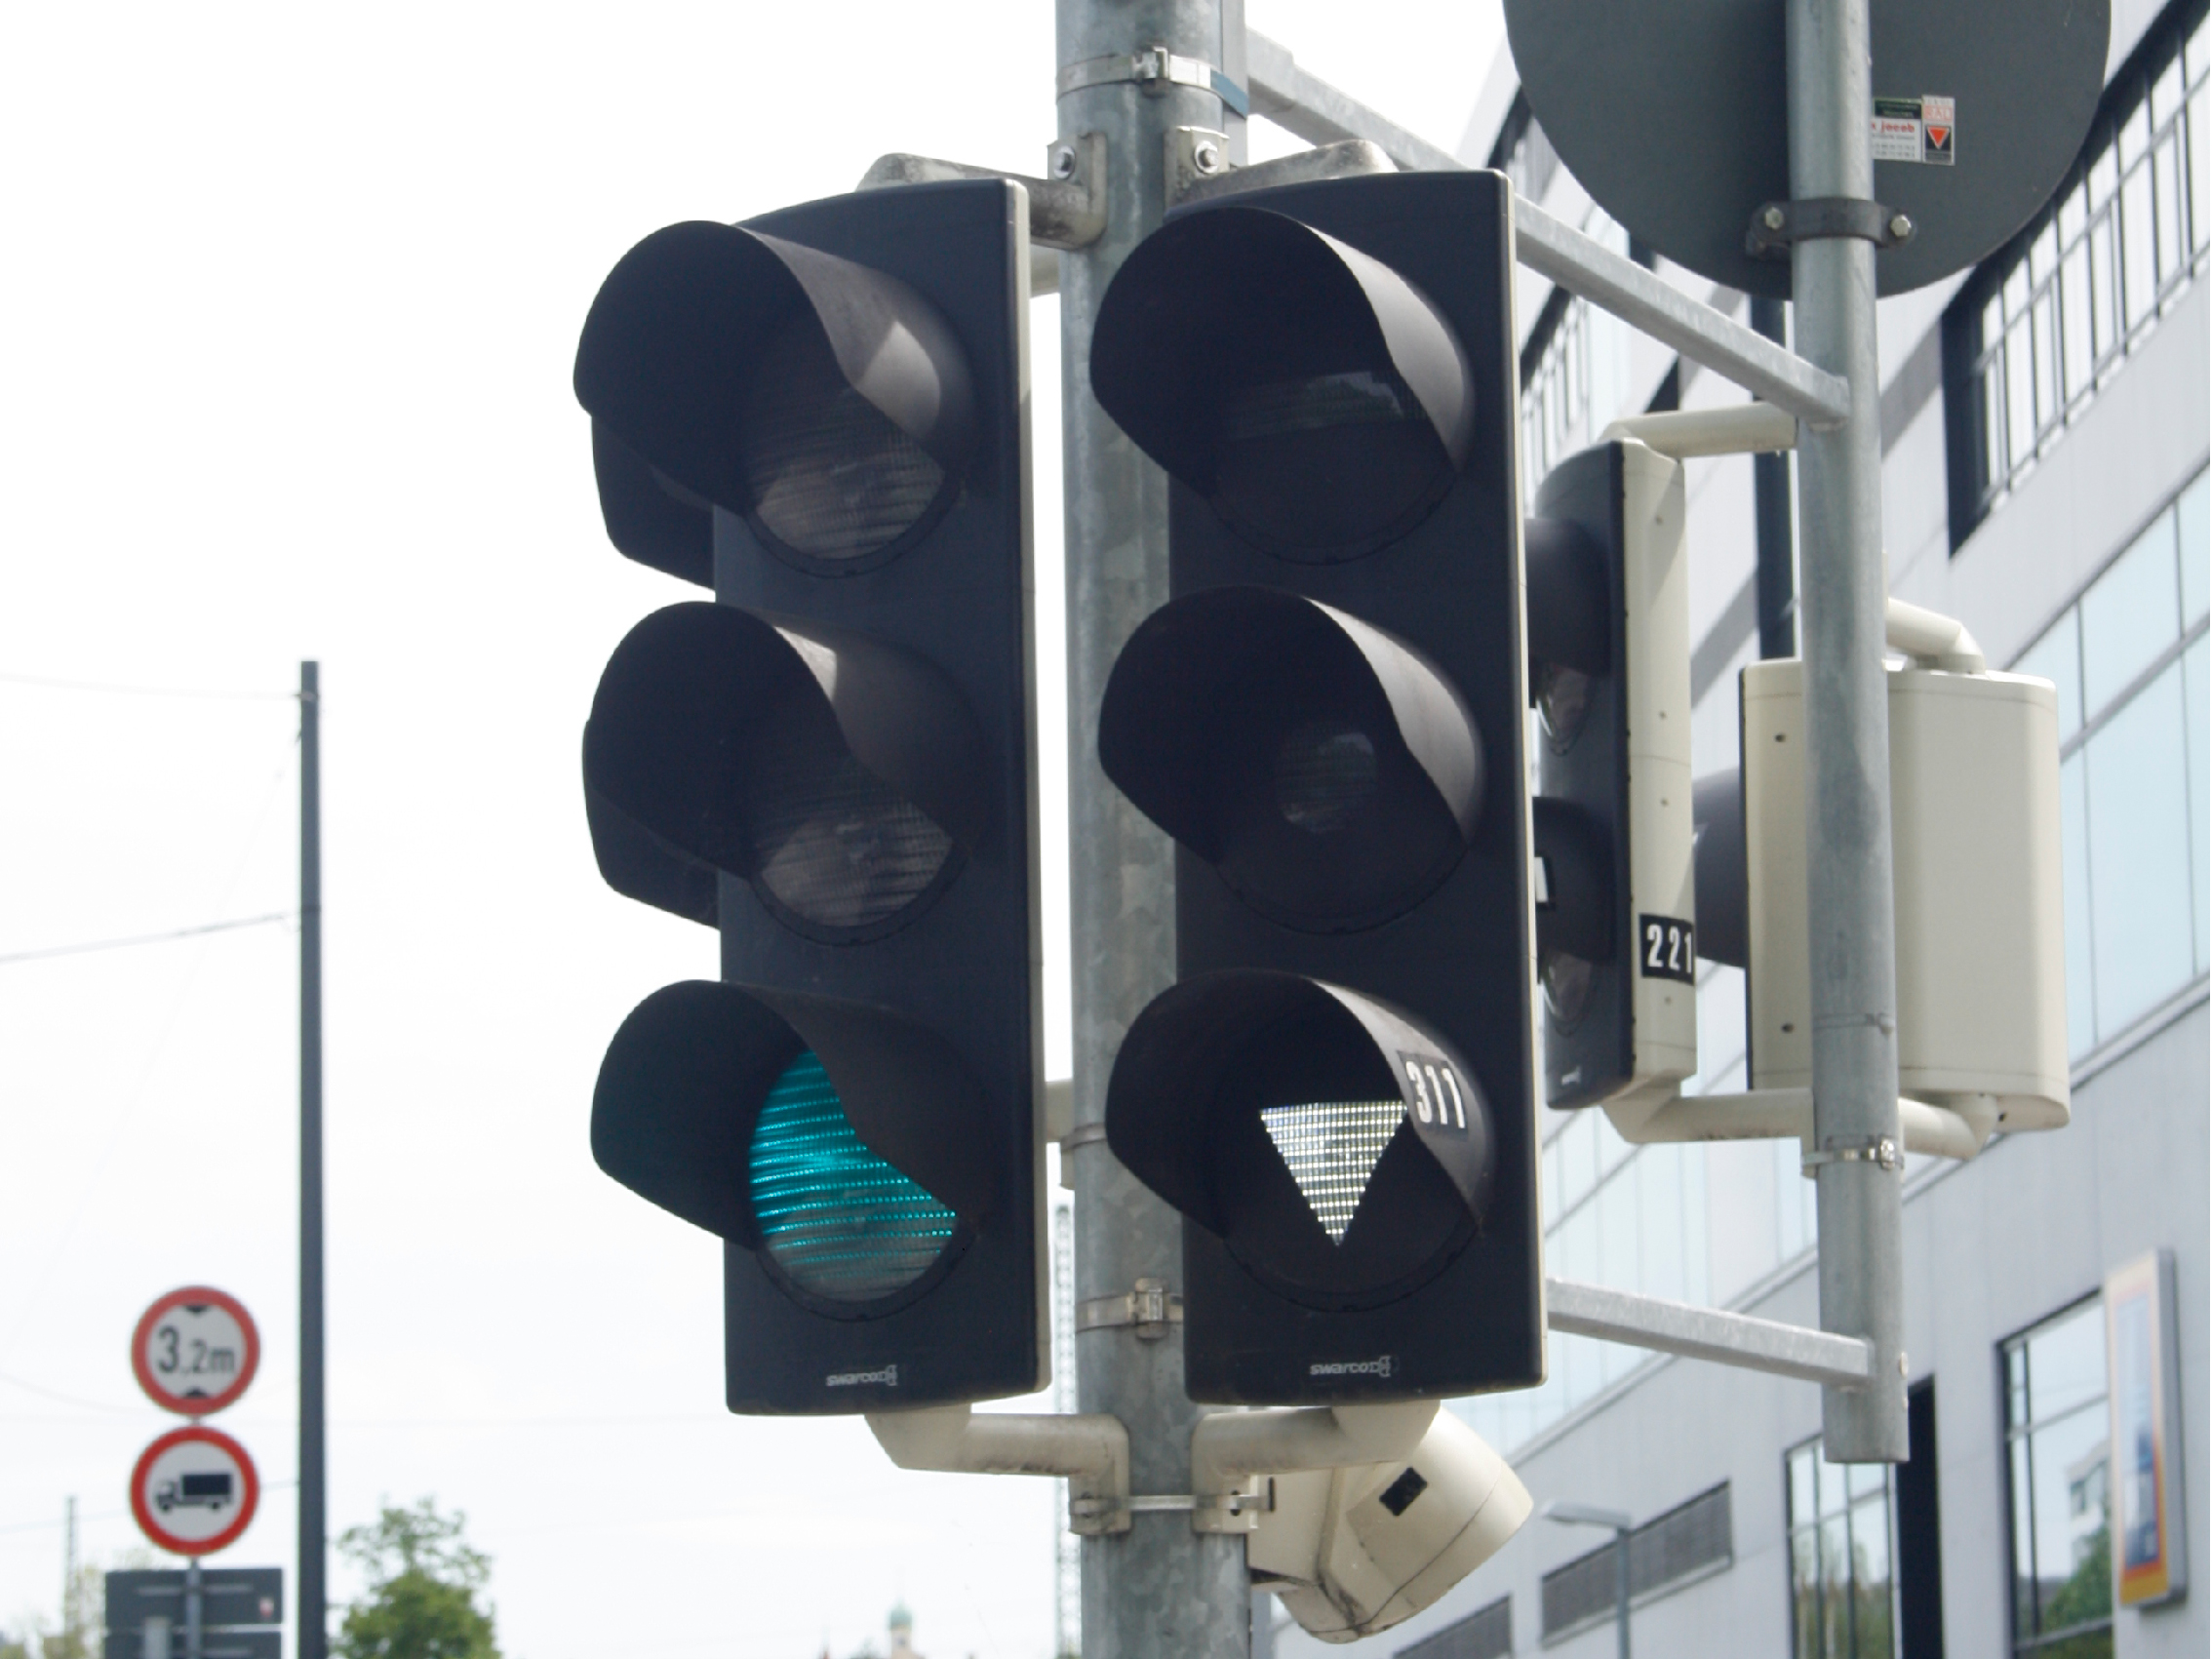 Bevorrangungsmaßnahmen im urbanen ÖPNV